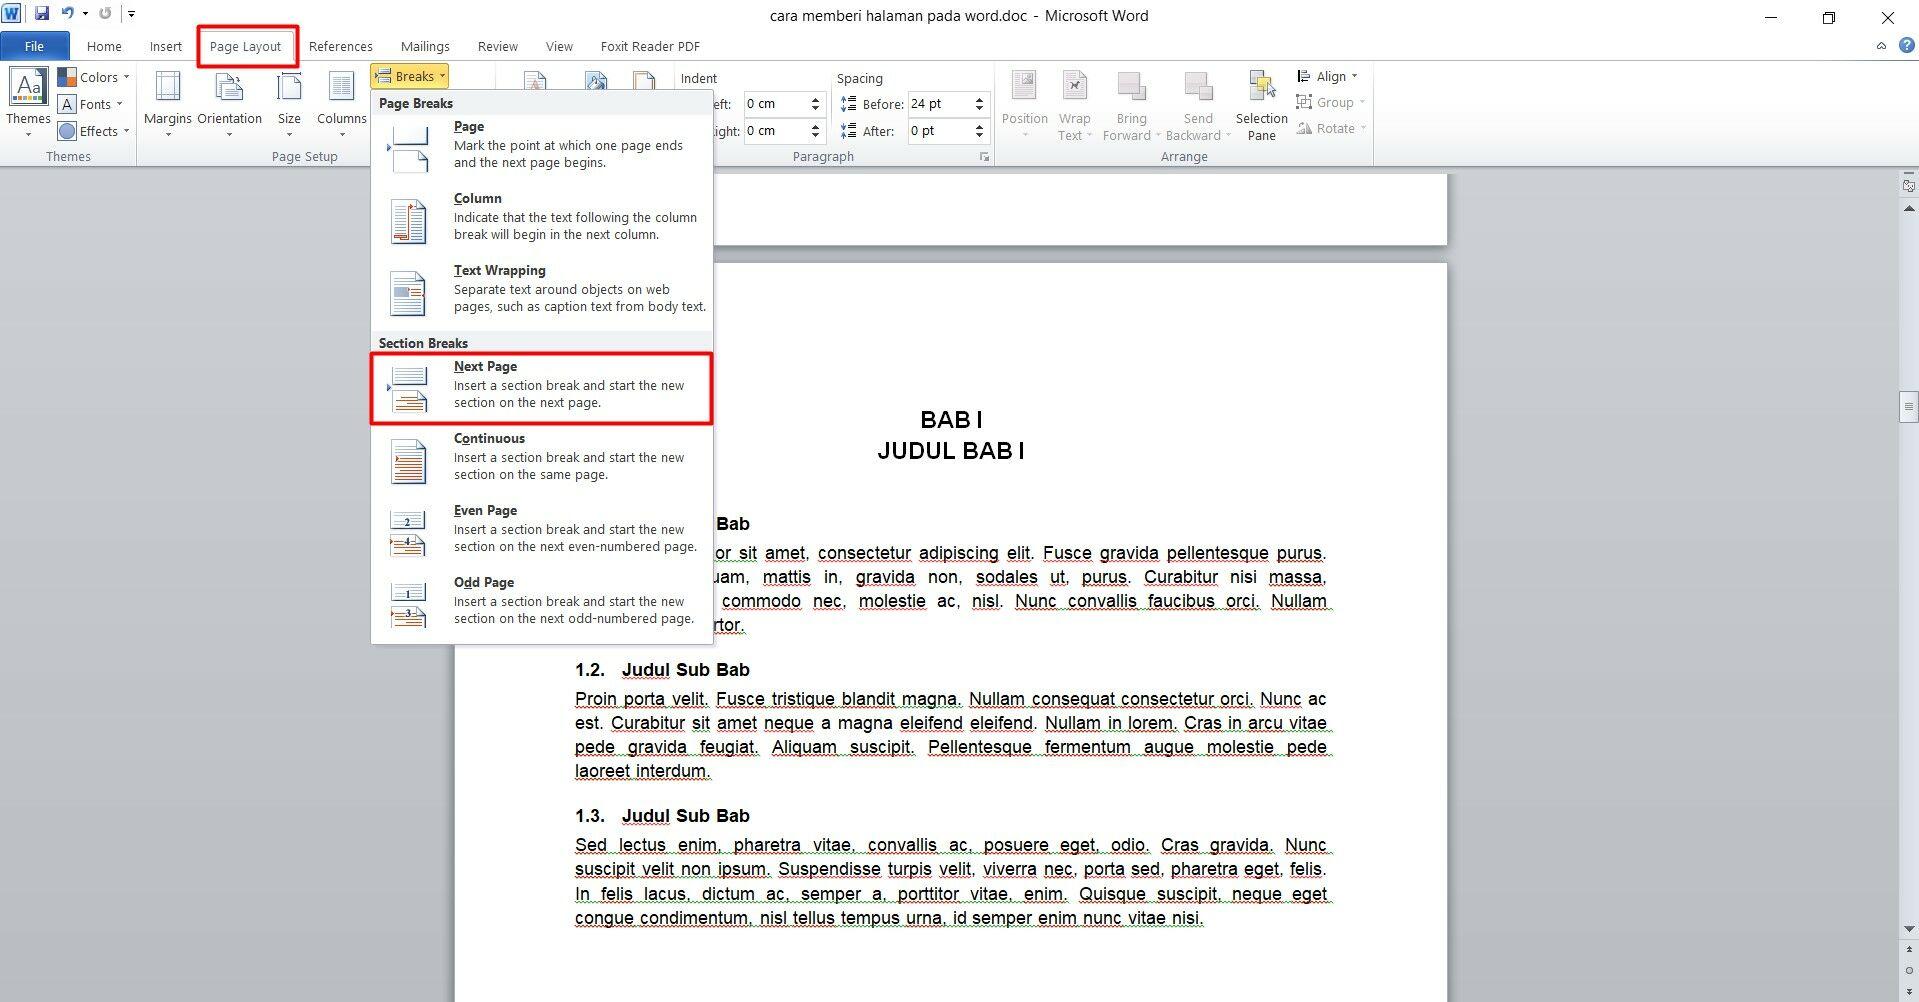 4 Cara Memberi Nomor Halaman Pada Word Mudah Rapi Jalantikus